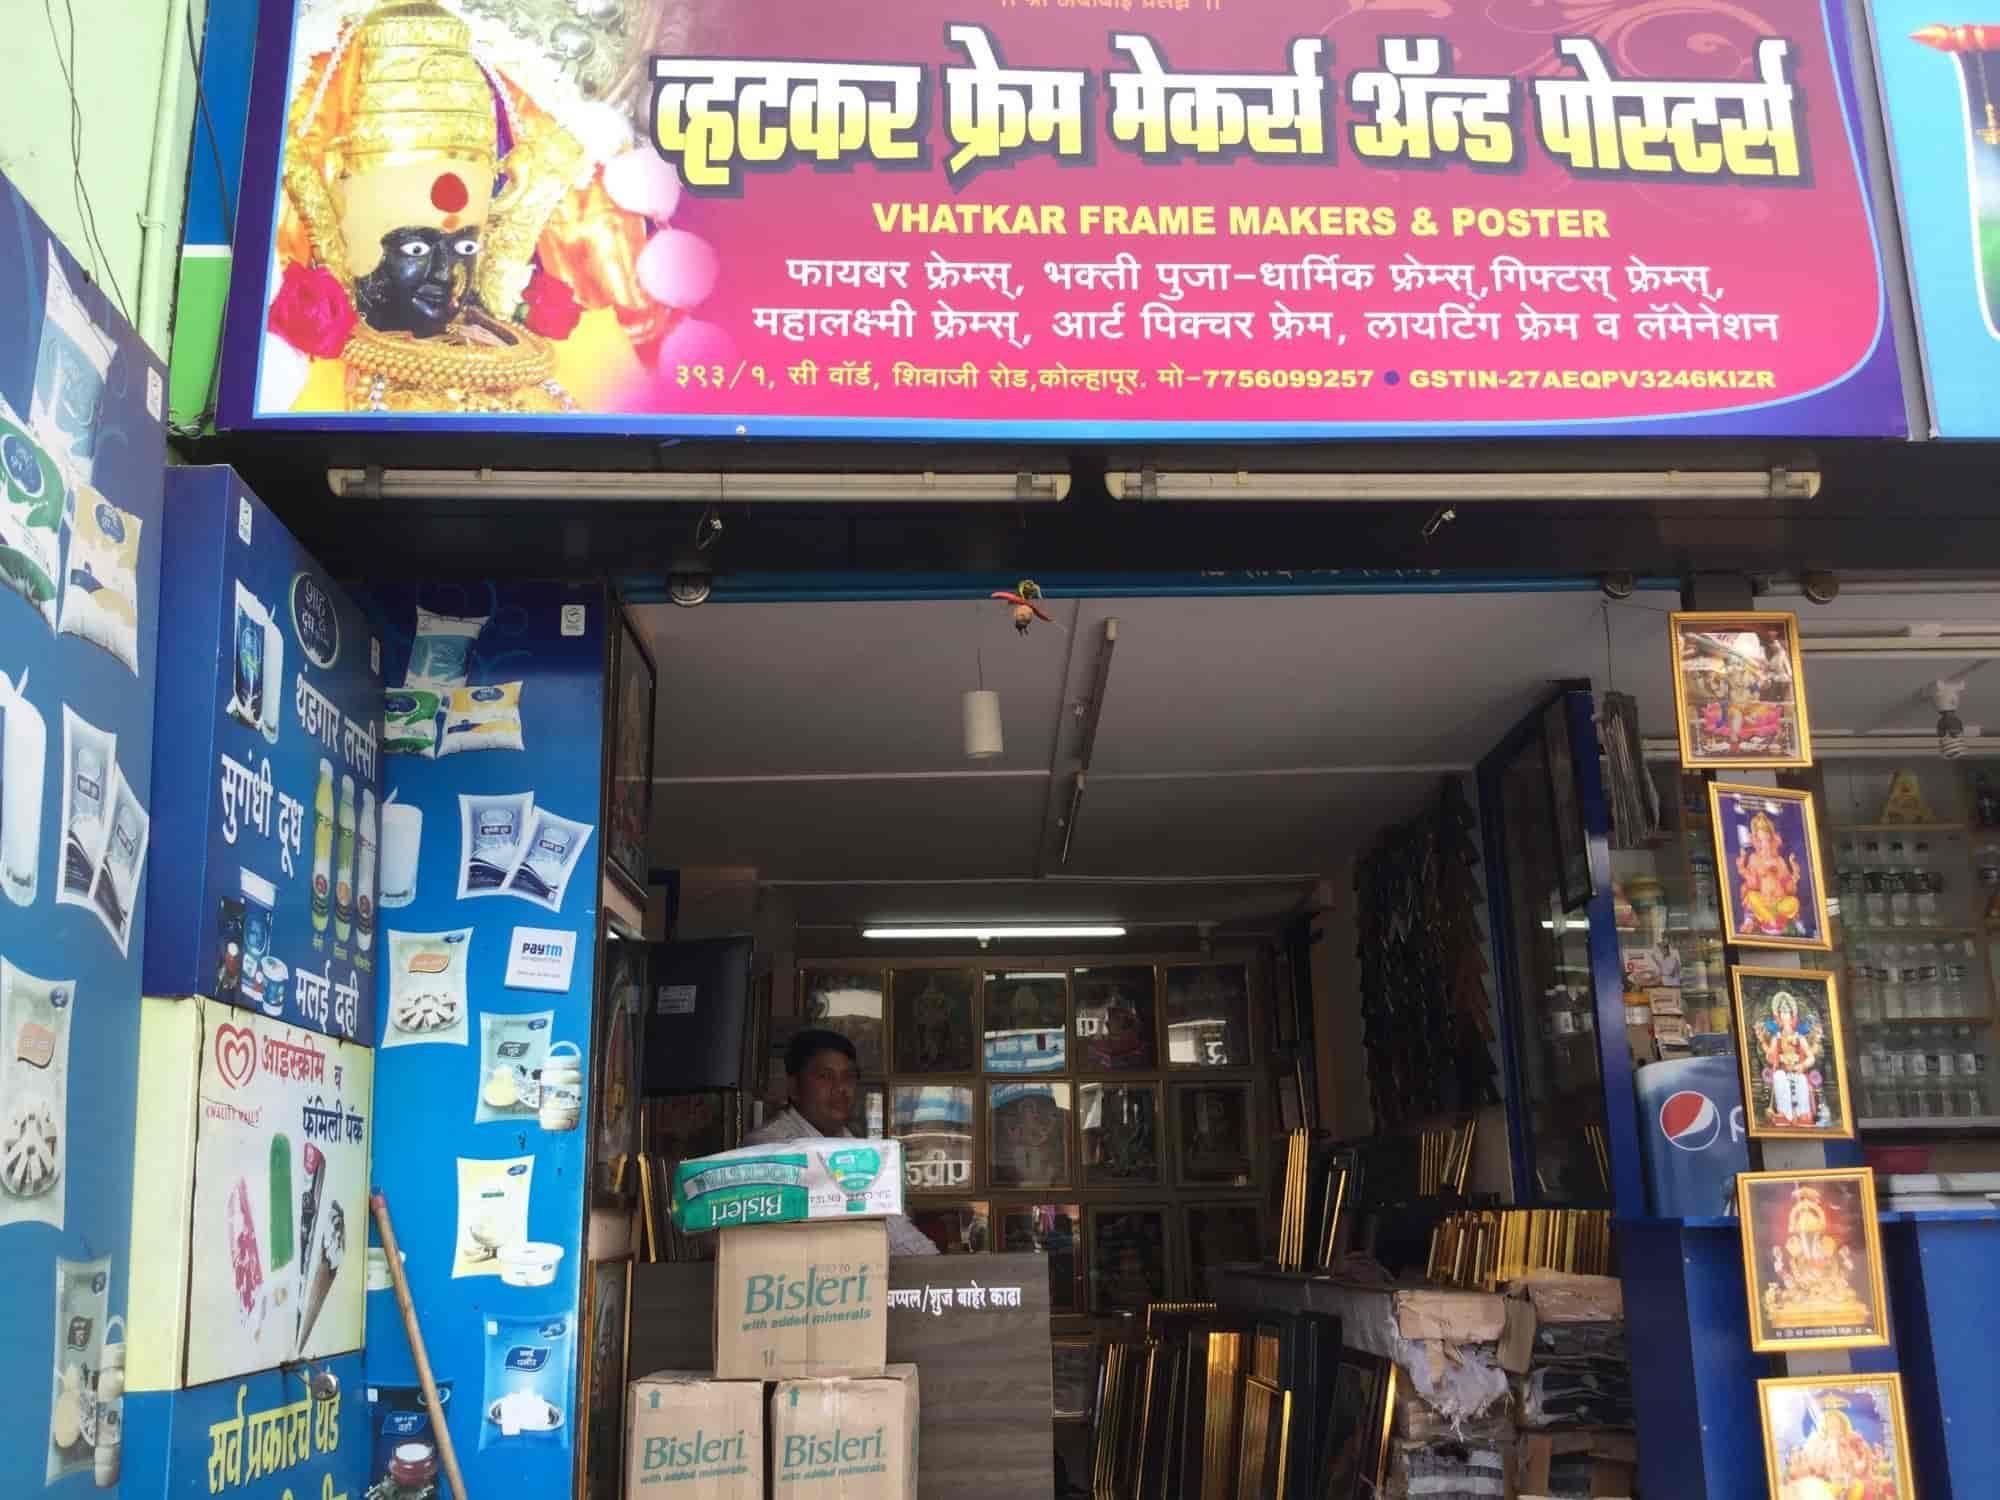 Vhatkar Frame Maker Poster Photos, Shivaji Peth, Kolhapur- Pictures ...